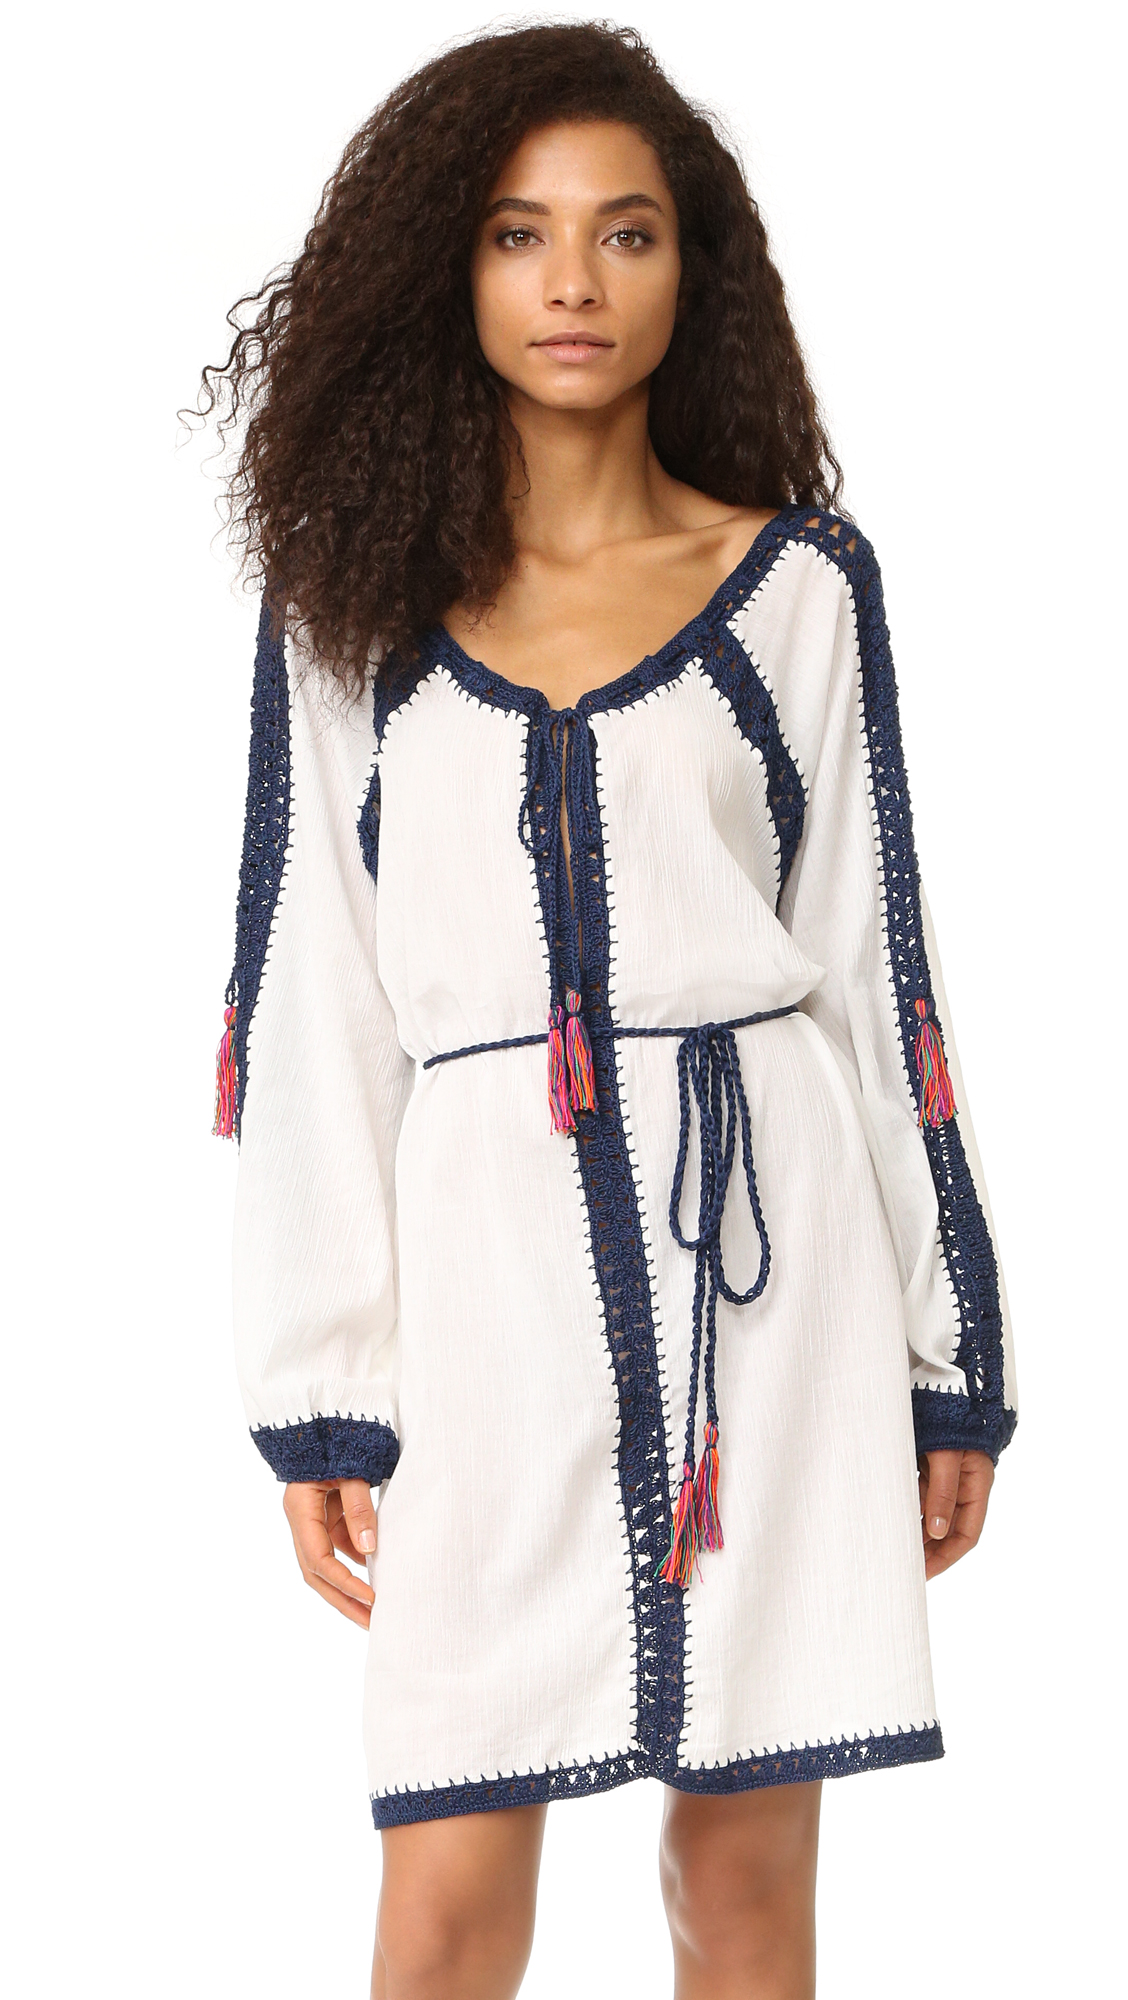 Anna Kosturova Nomad Boho Mini Dress - Sailor Nomad at Shopbop